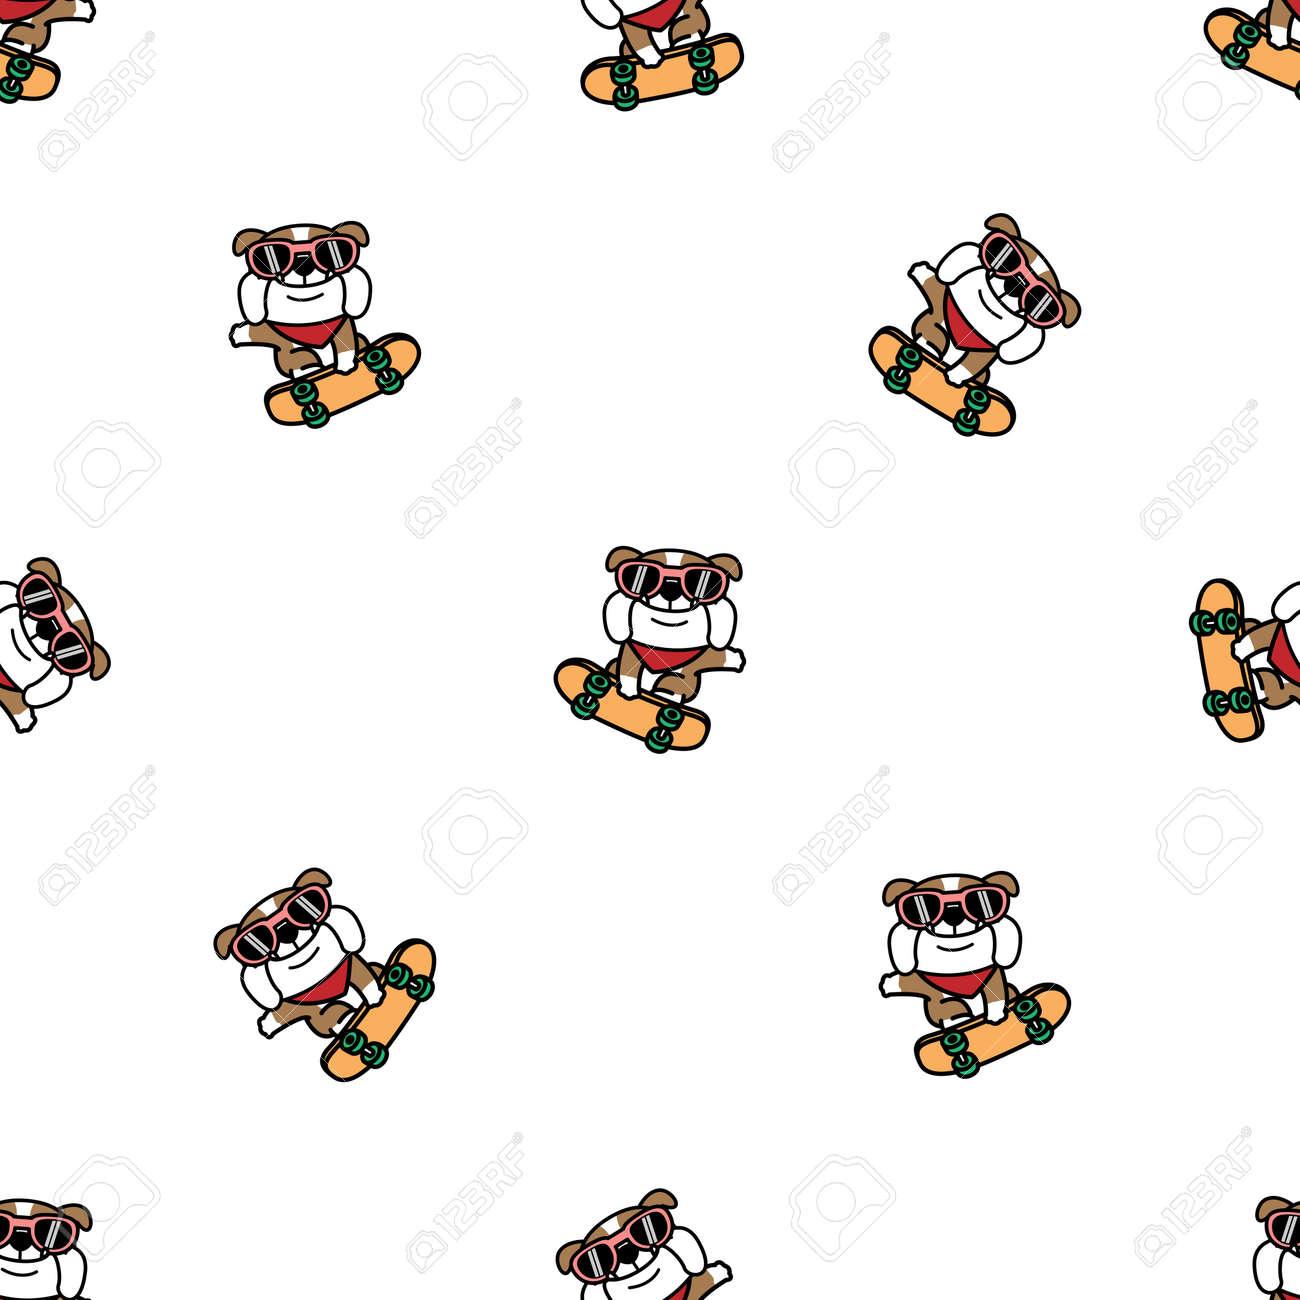 Cute bulldog dog playing skateboard cartoon seamless pattern, vector illustration - 170587213